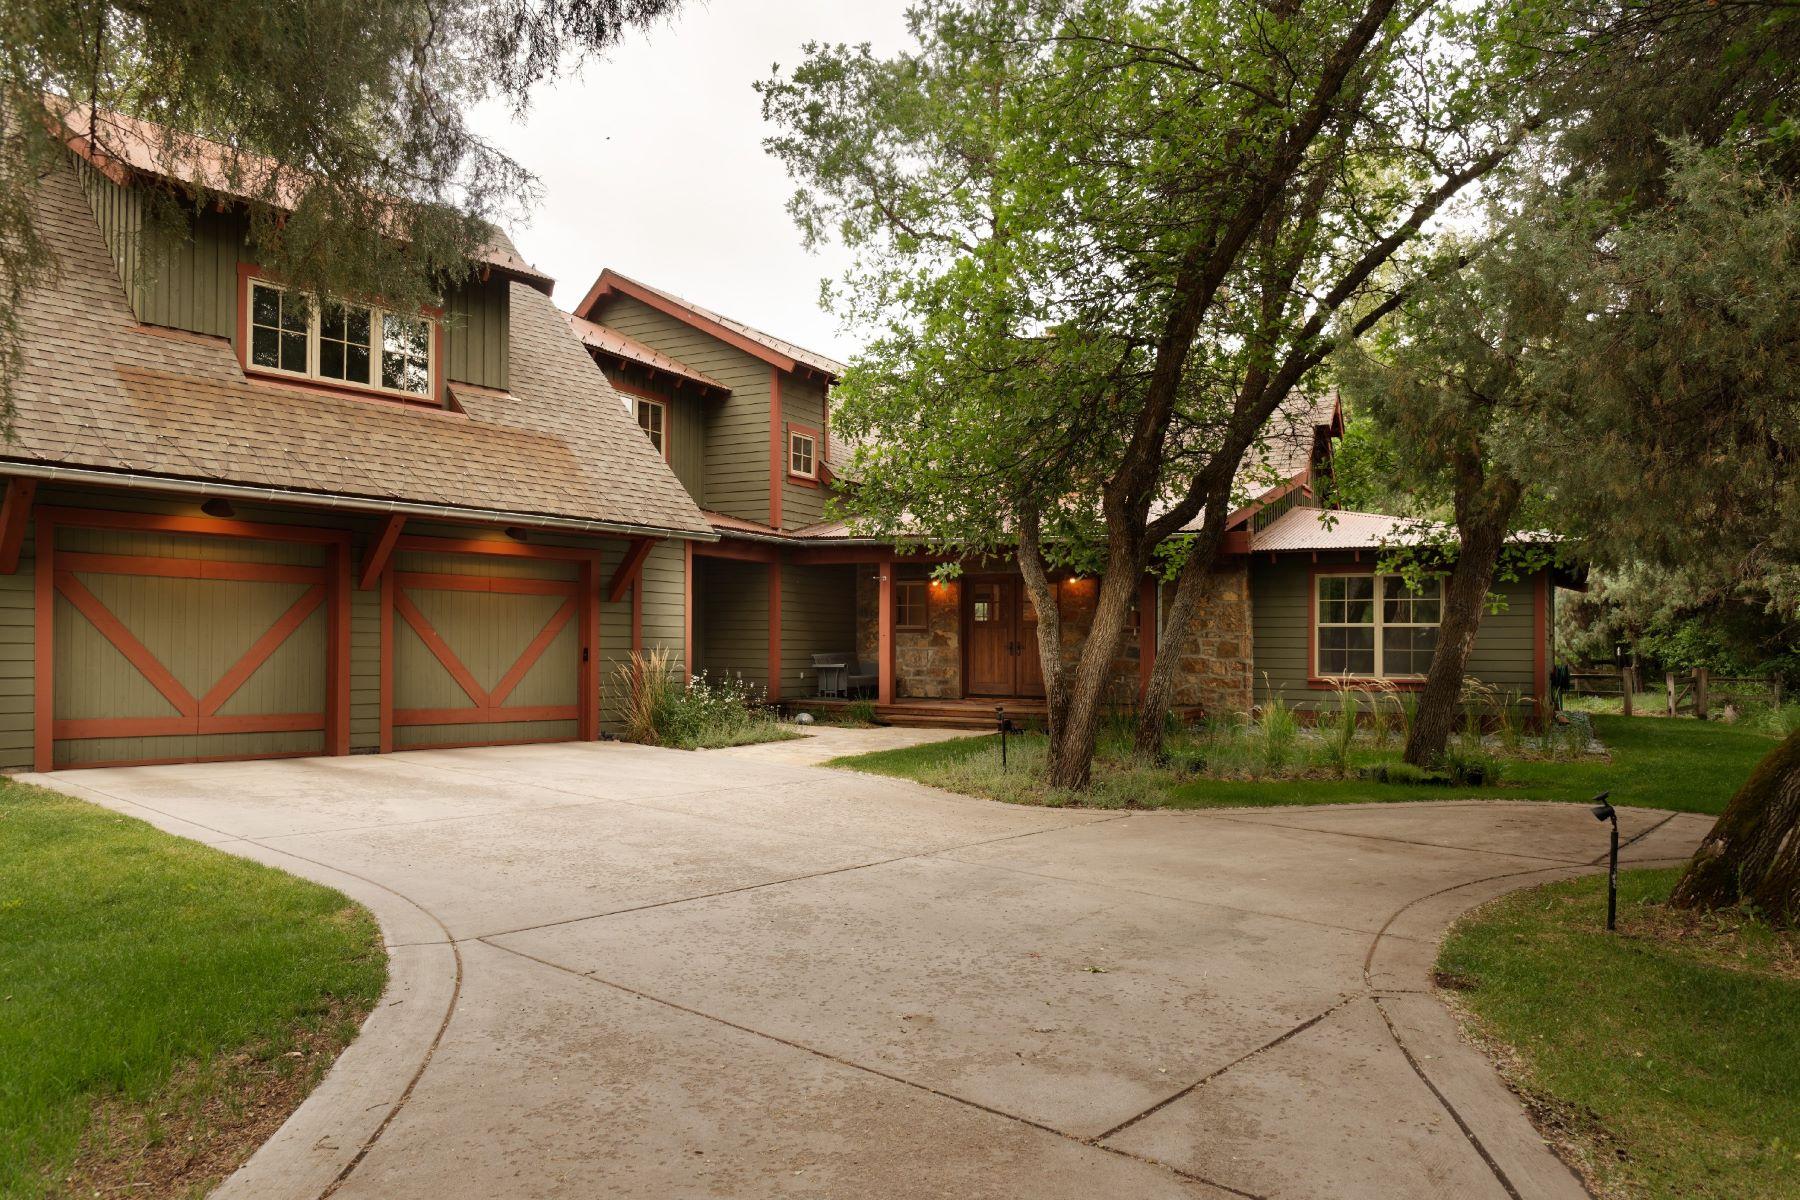 Single Family Home for Sale at River Oaks 100 River Oaks Lane Basalt, Colorado, 81621 United States